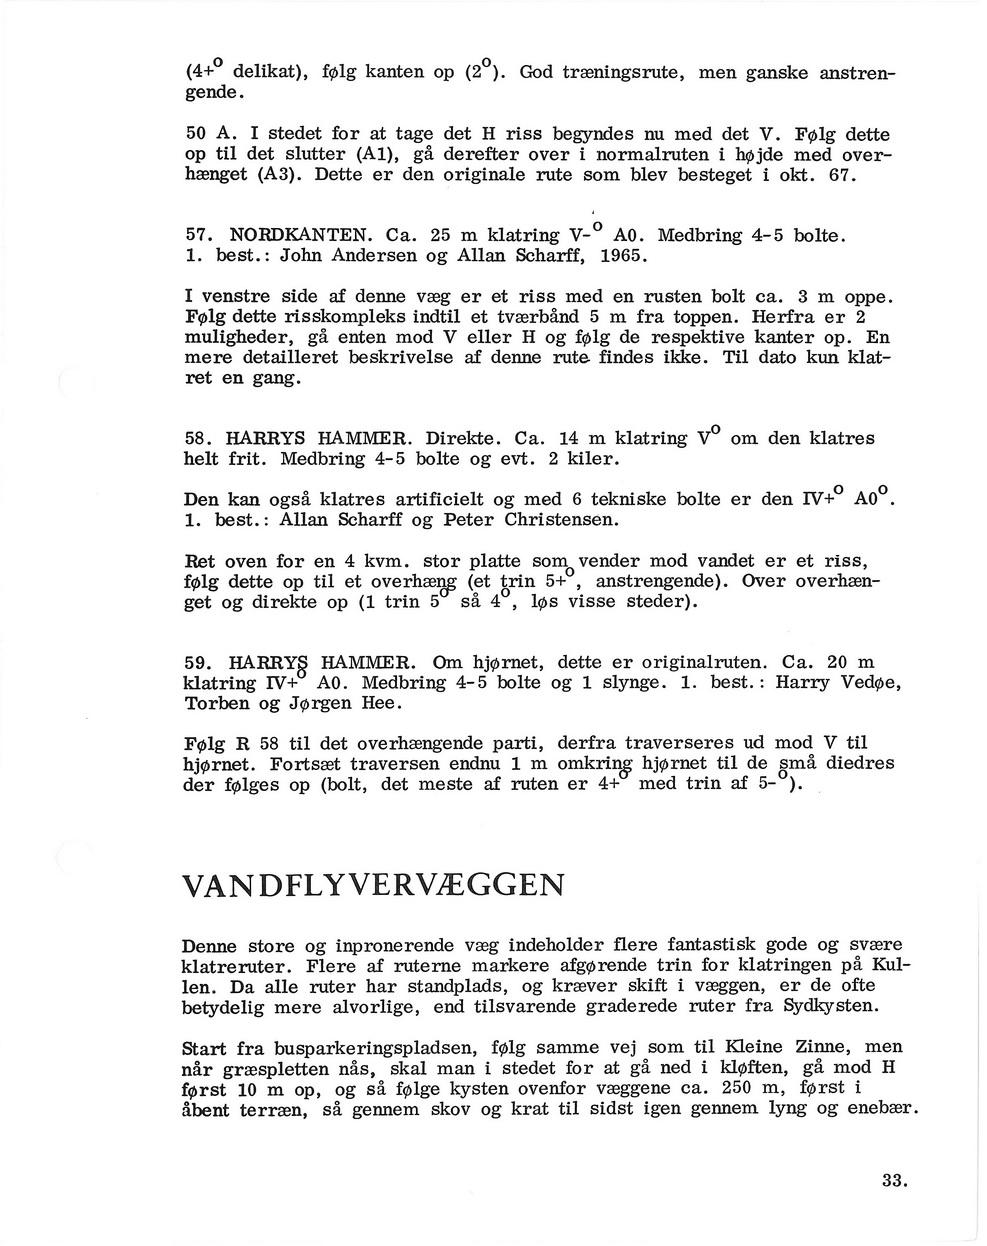 Kullen guide 1972 033.jpg